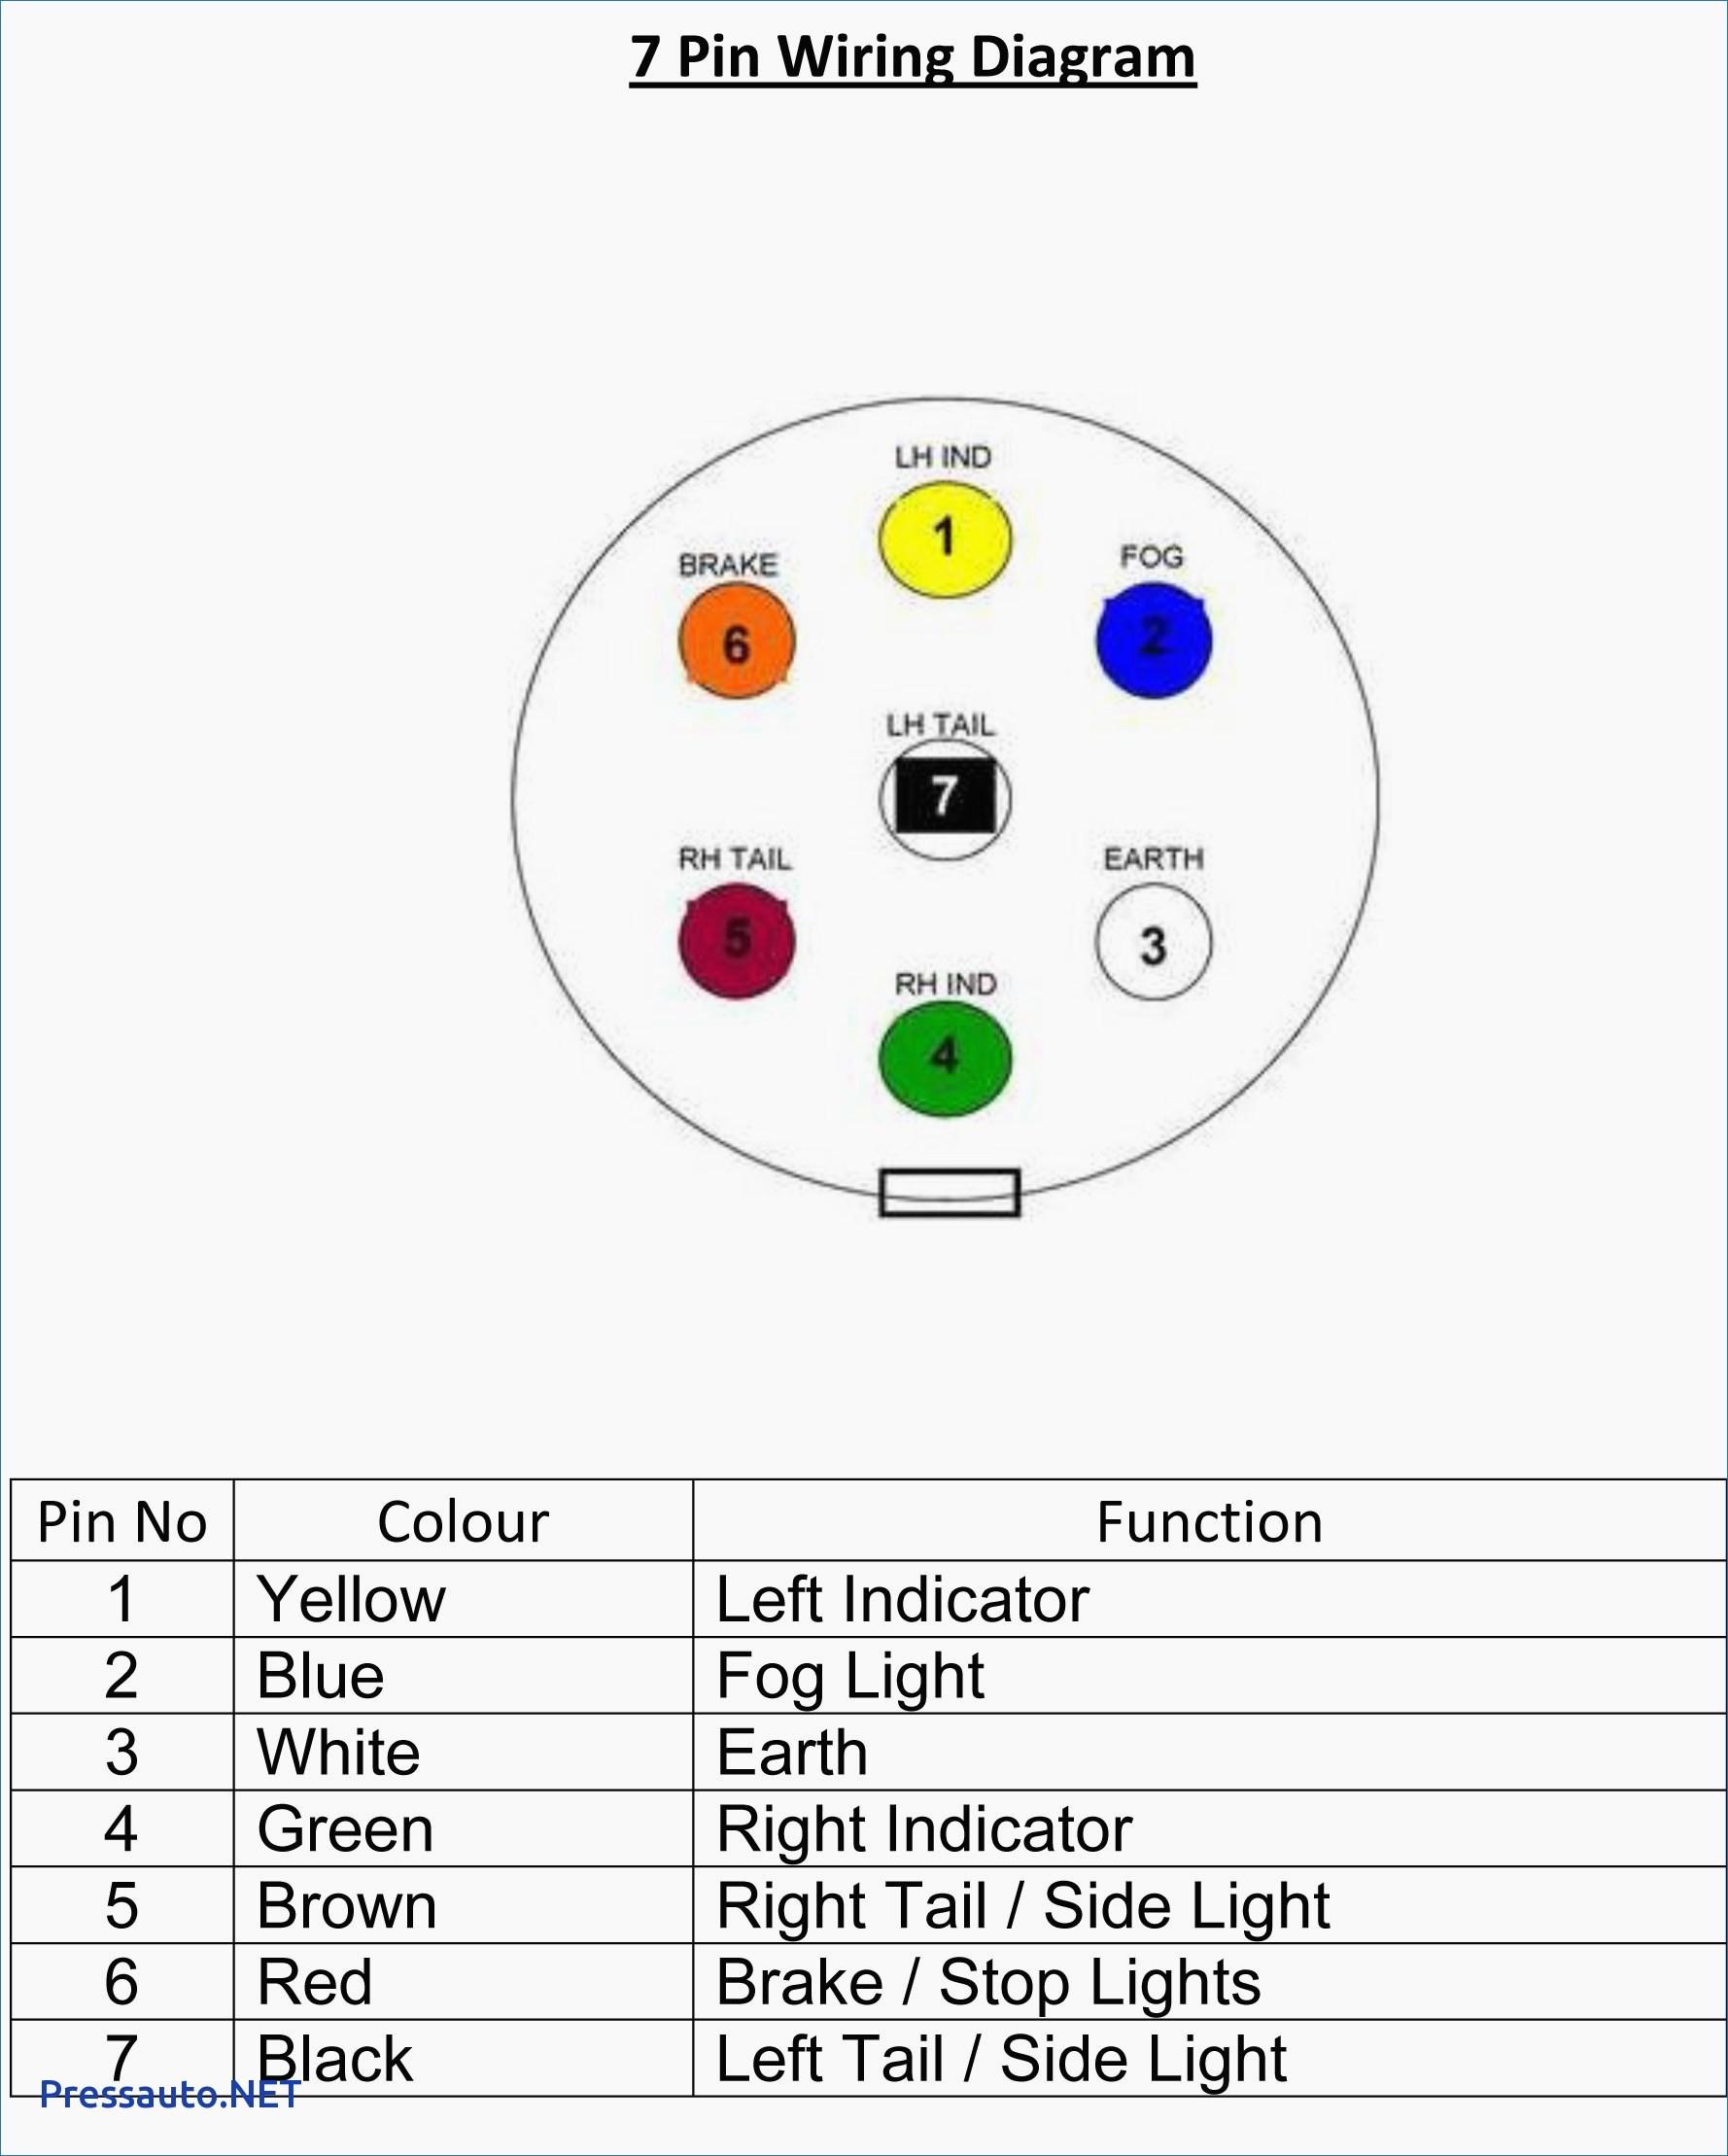 FL_1008] Boat Light Wiring Diagram On Chevy 7 Pin Trailer Wiring Diagram  Schematic WiringAlly Lukep Umng Mohammedshrine Librar Wiring 101